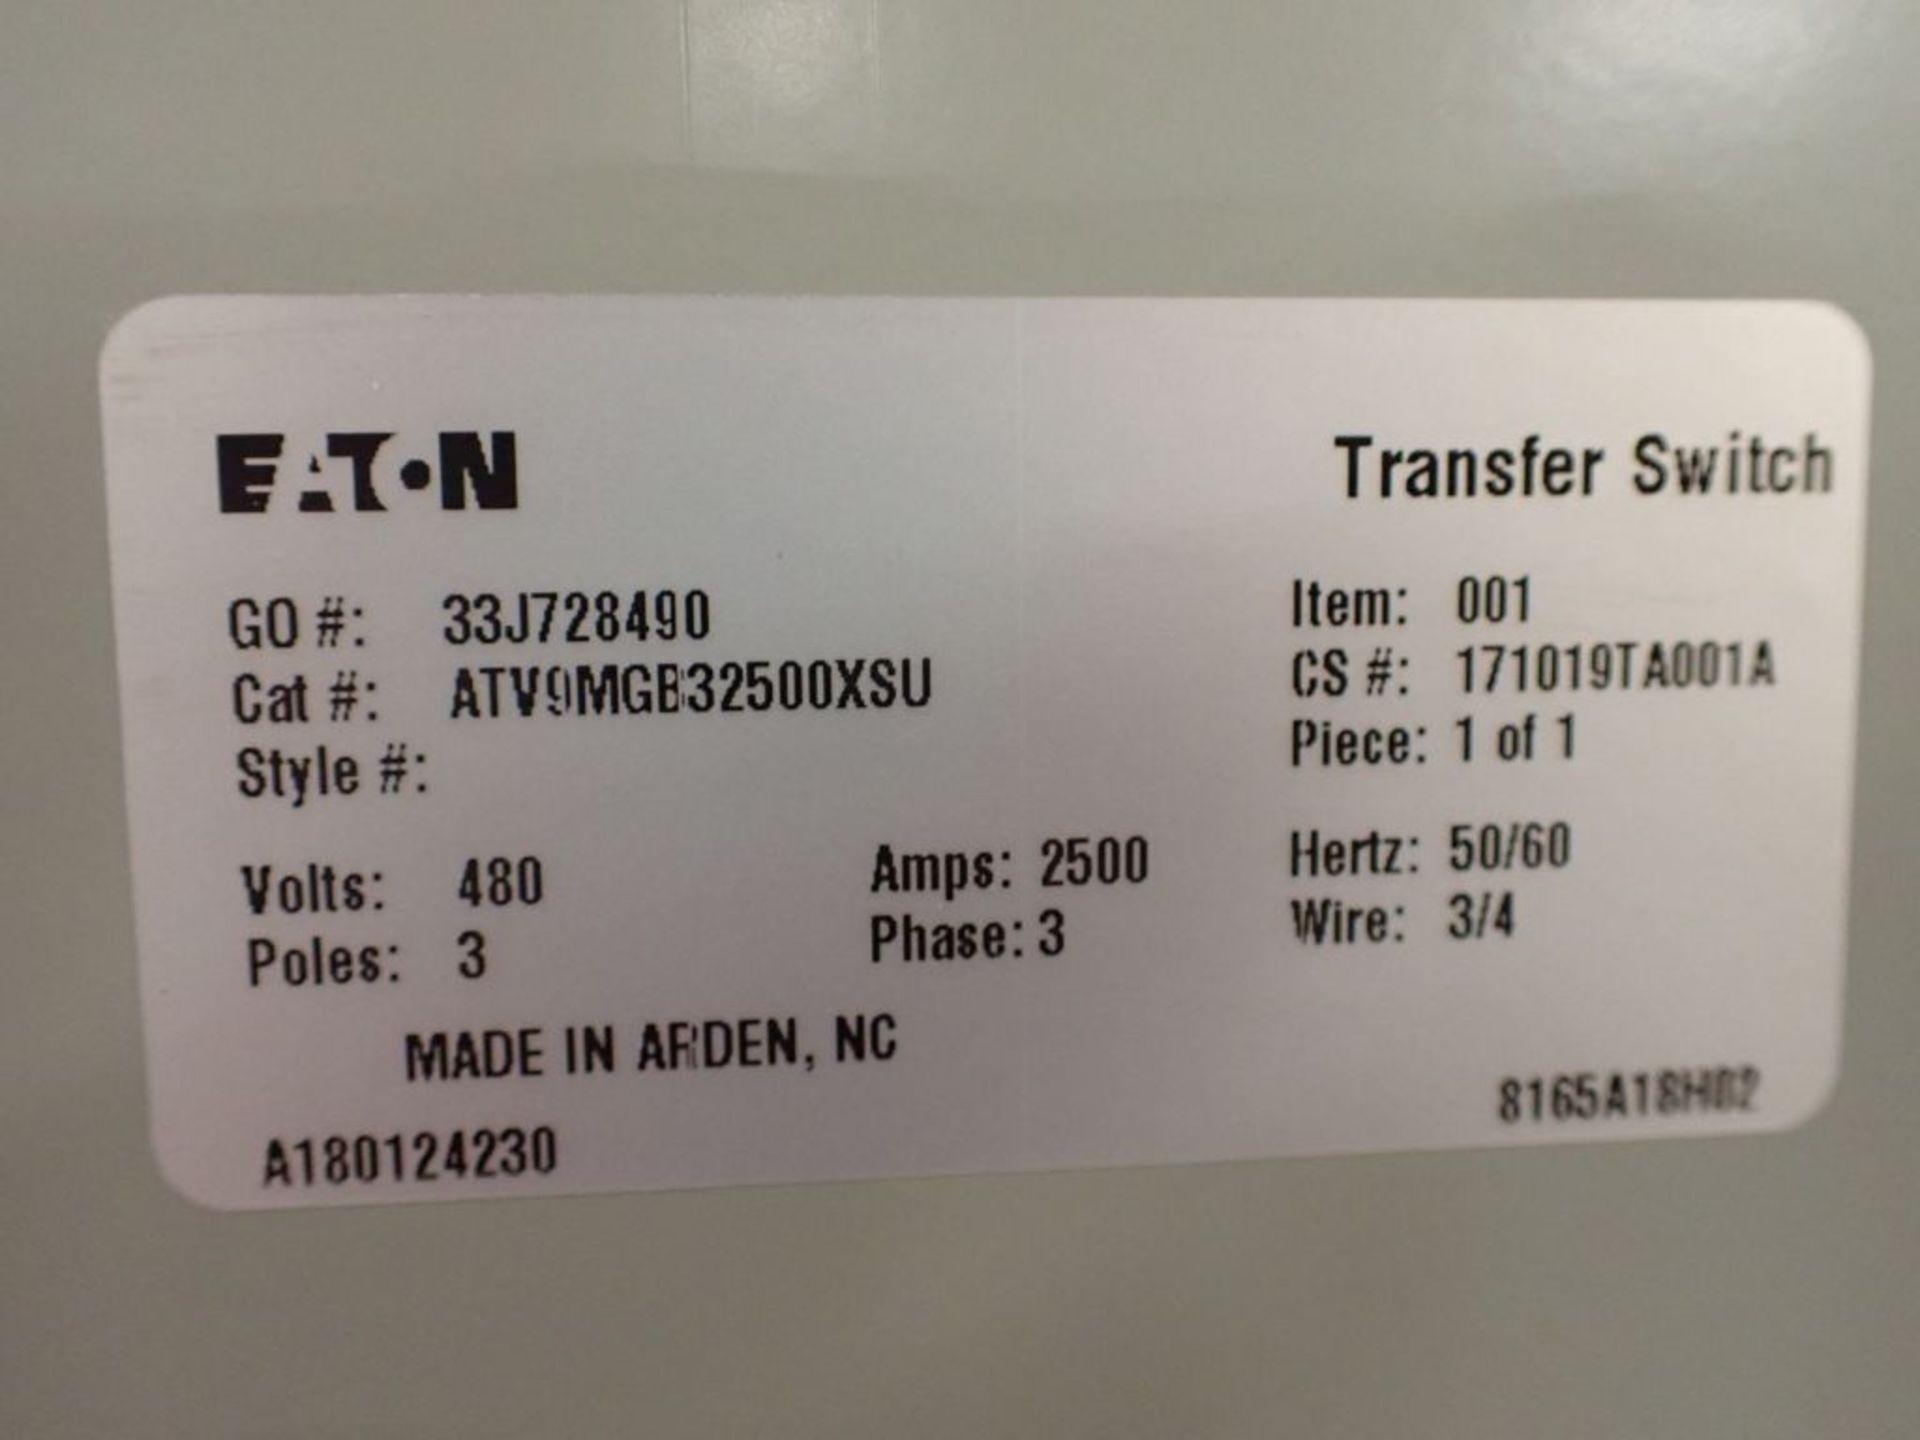 Eaton Transfer Switch | Cat No. ATV9MGB32500XSU; 480V; 3 PH; 2500A; (2) Eaton Magnum DS Circuit - Image 49 of 50